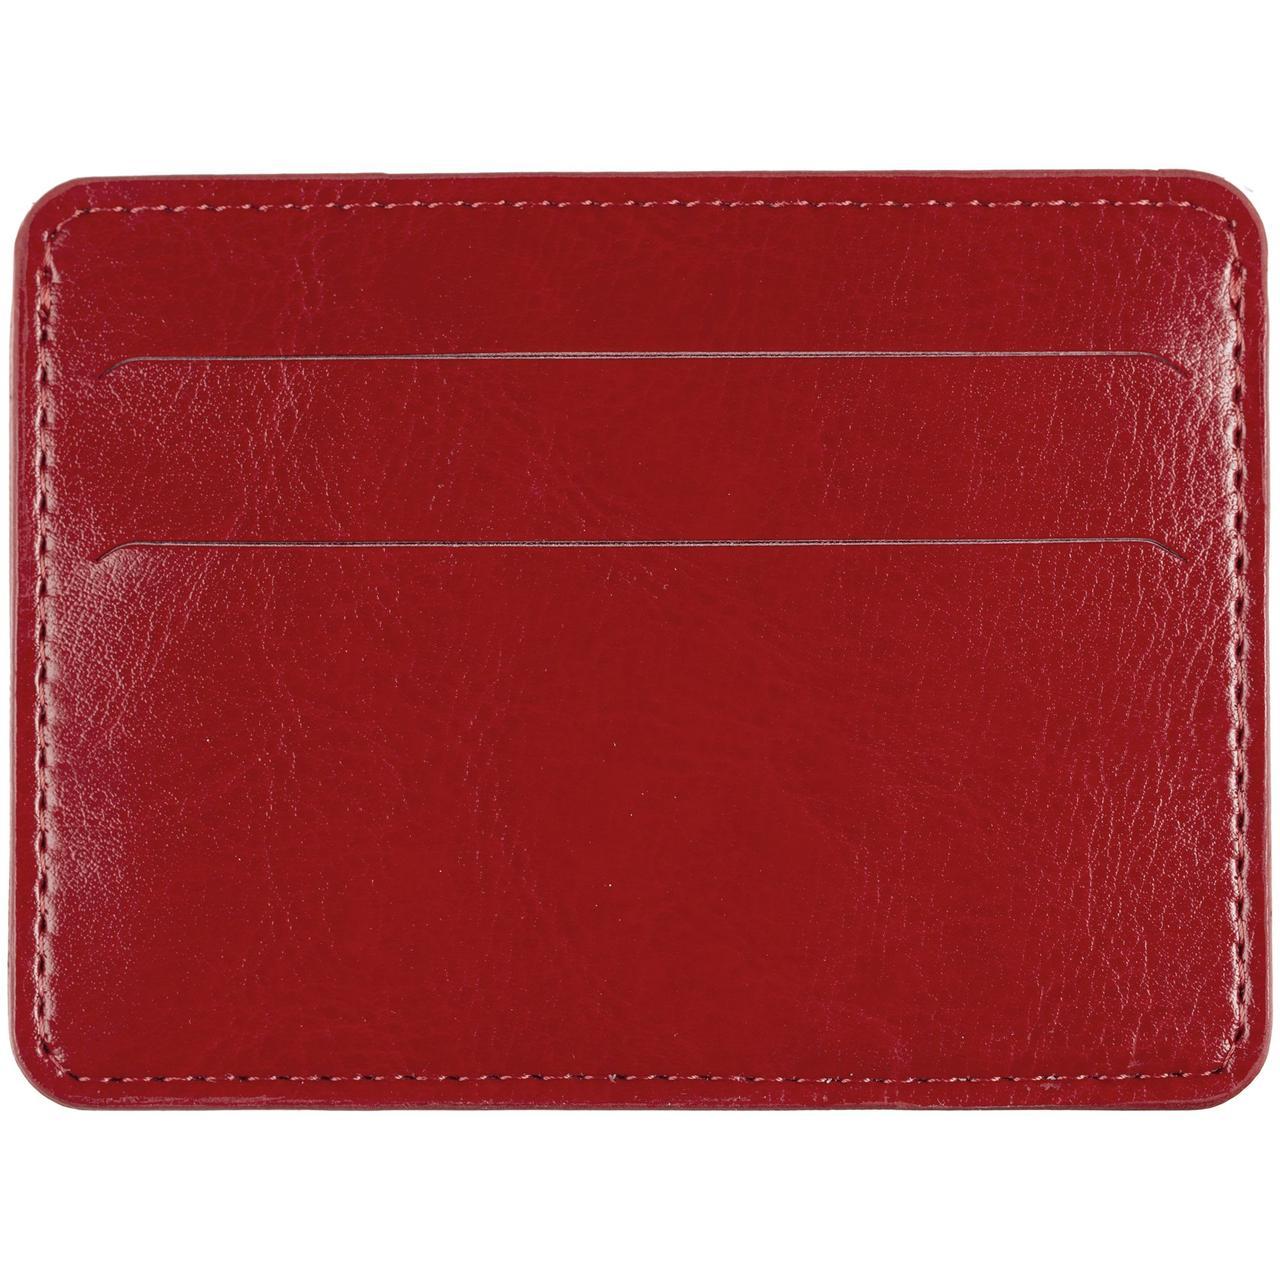 Чехол для карточек Nebraska, красный (артикул 12881.50)